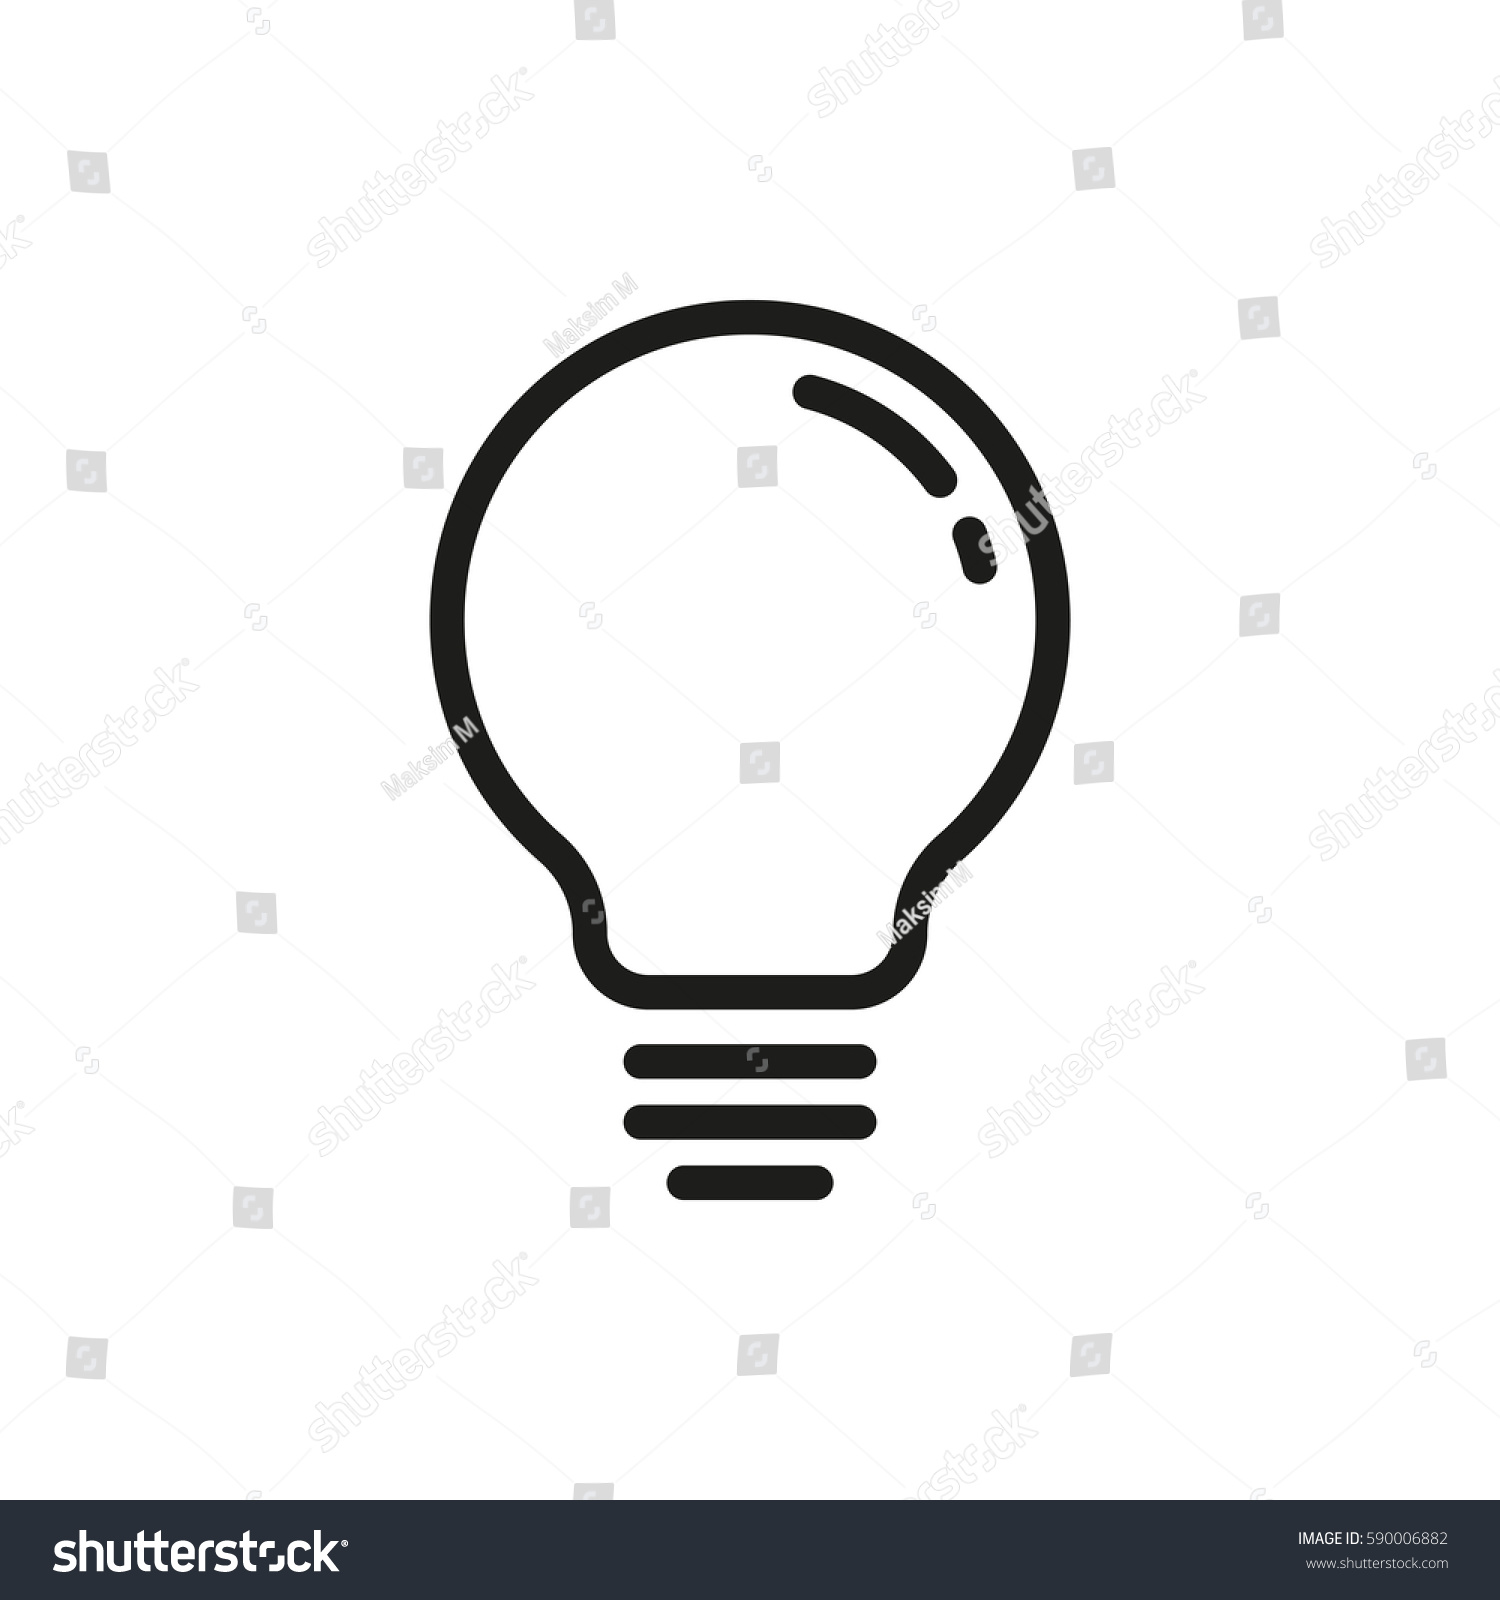 lightbulb vector icon stock vector 2018 590006882 shutterstock rh shutterstock com vector light bulb clip art light bulb icon vector